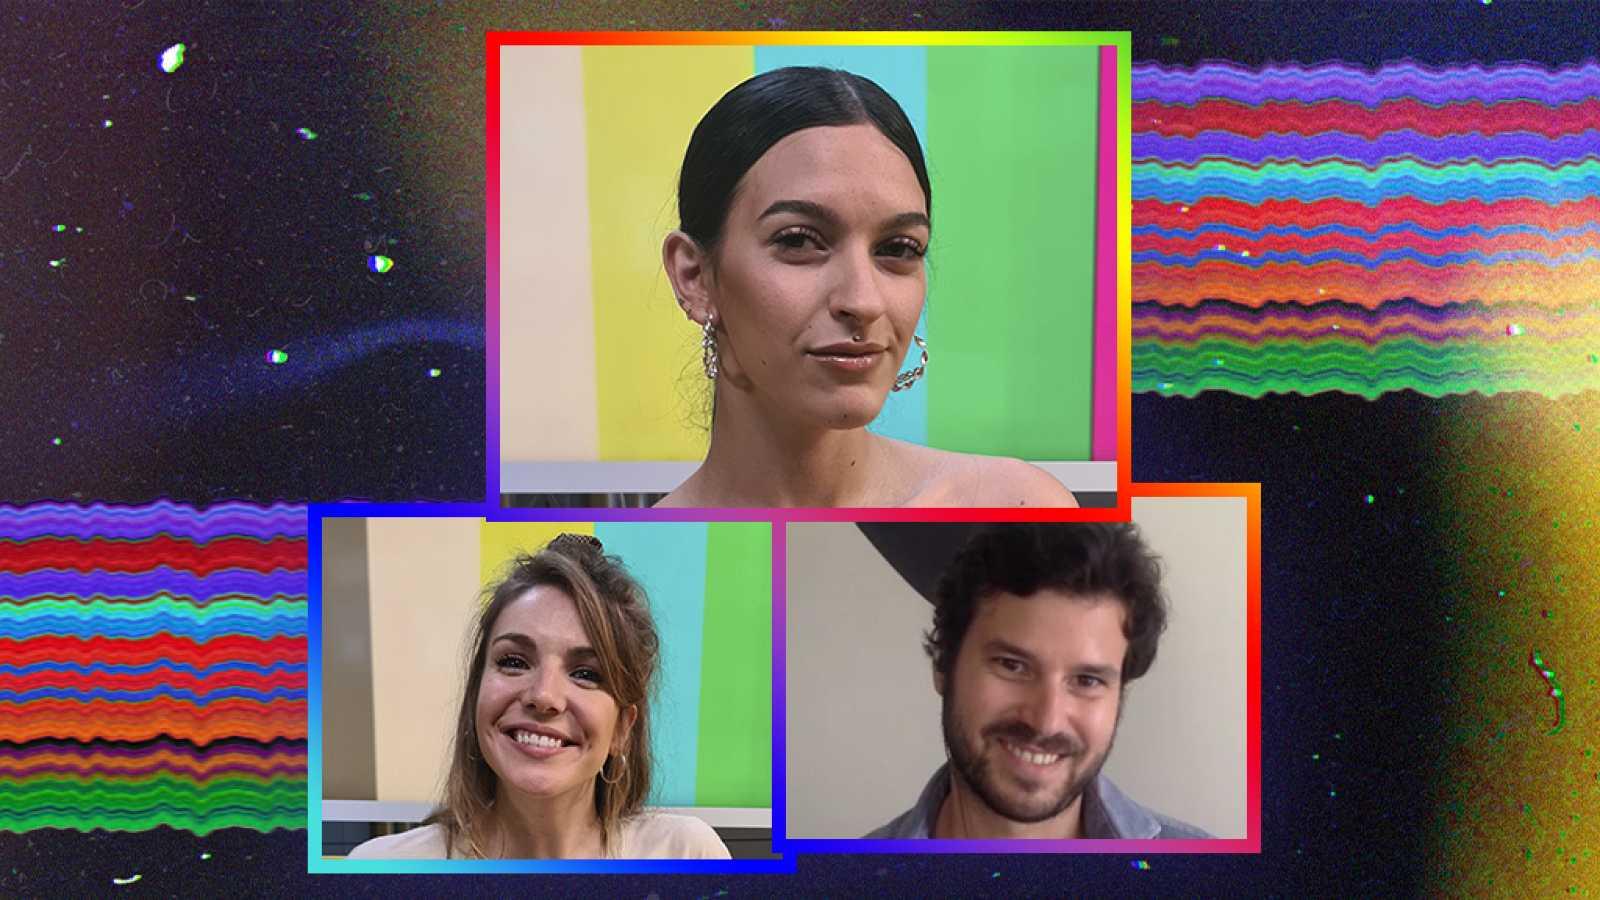 OK Playz - OK Playz con Cherry Massia, Guillermo Bárcenas e Inés Hernand